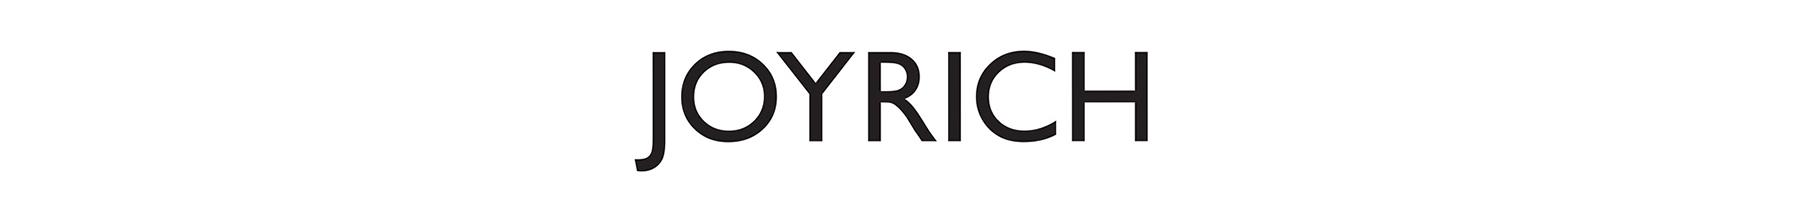 DrJays.com - Joyrich